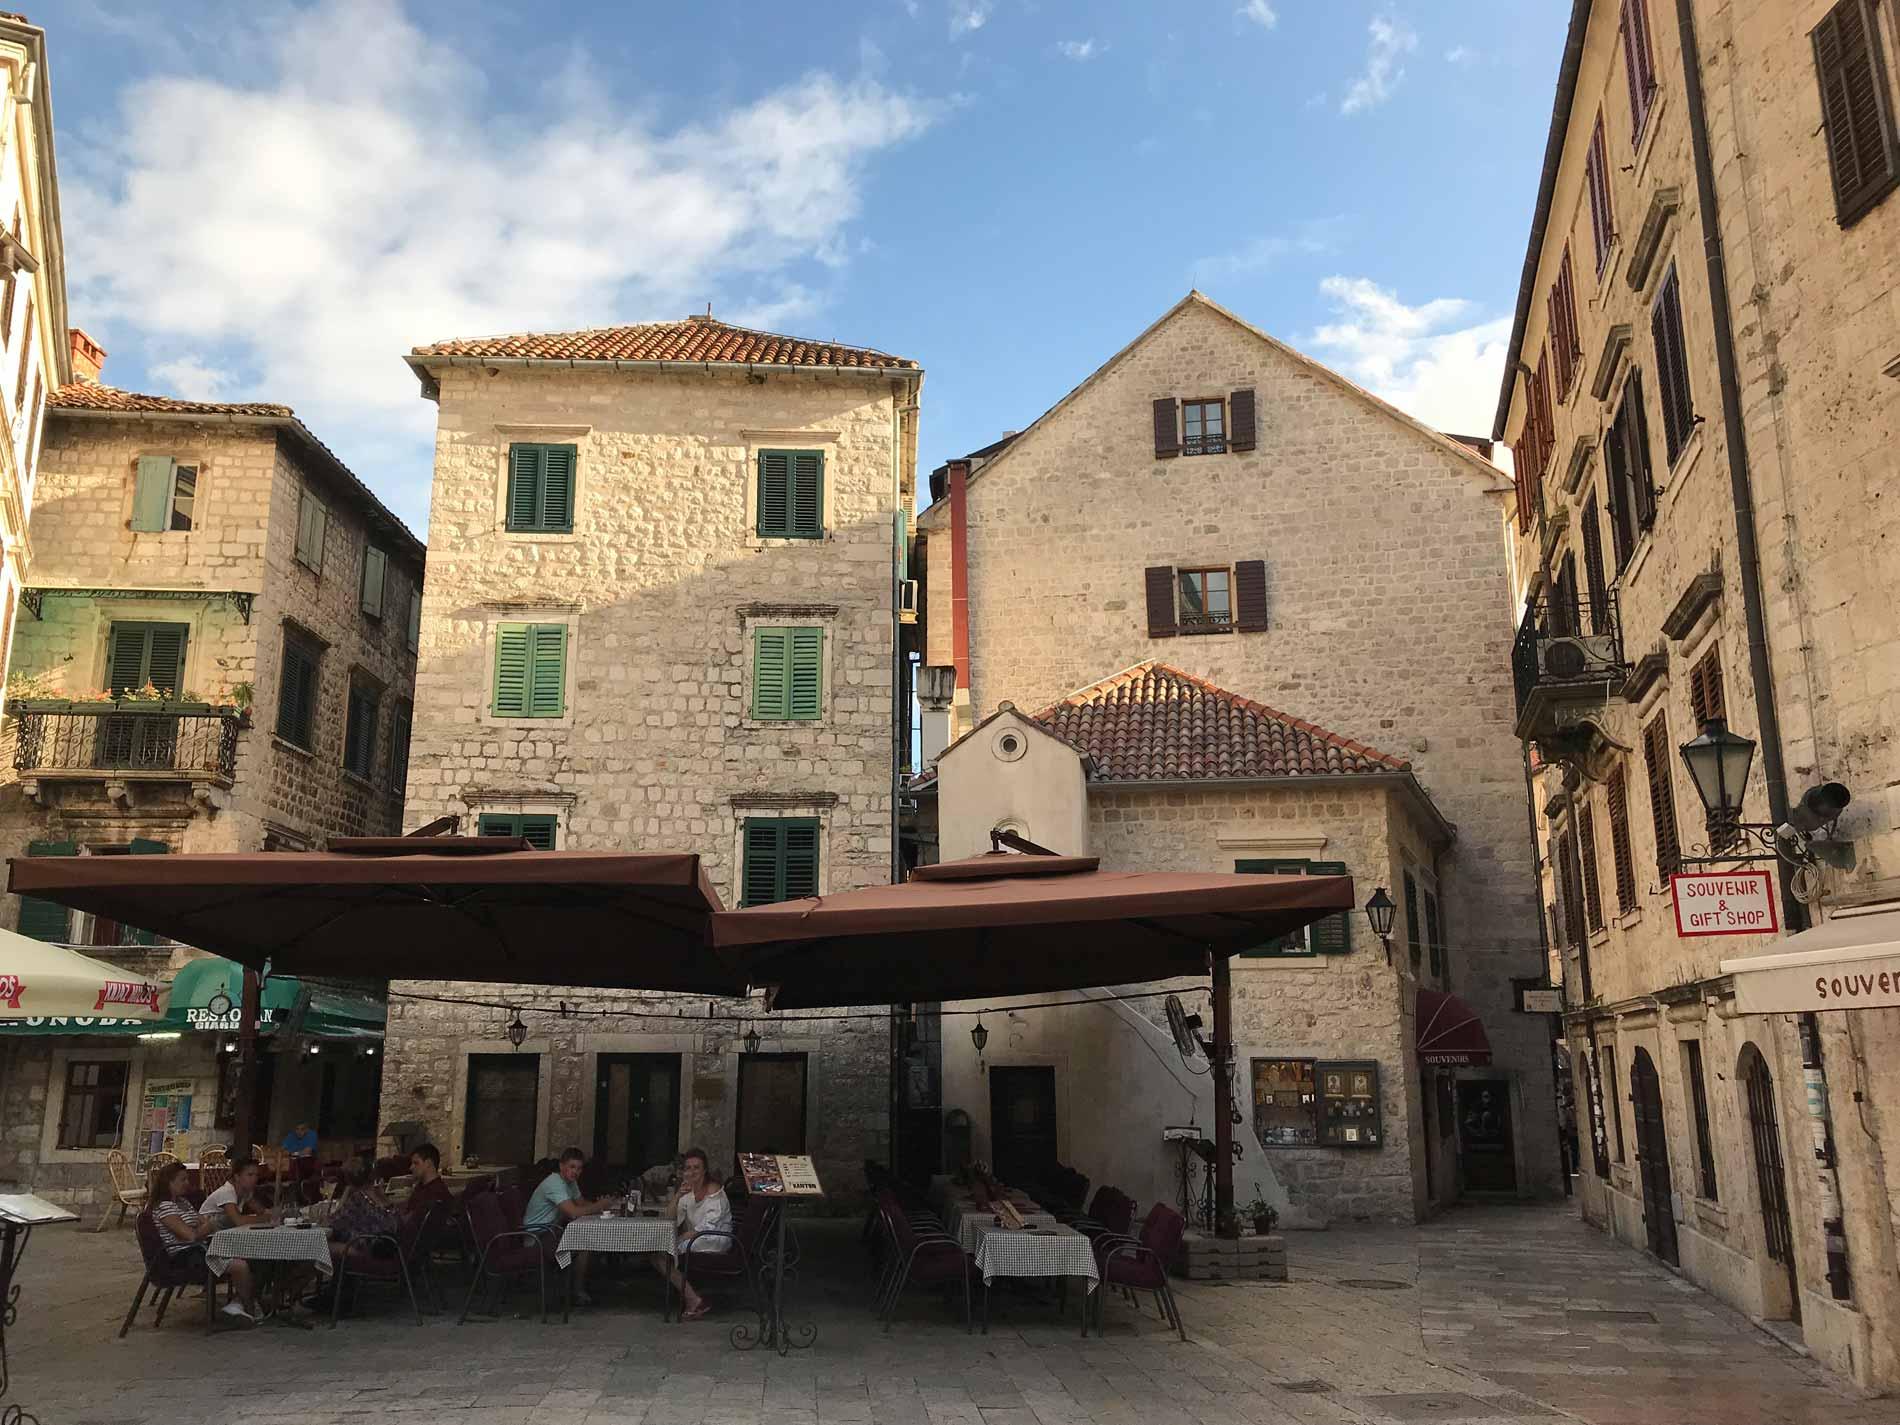 Kotor-Montenegro-Piazza-San-Luca-case-ristorante